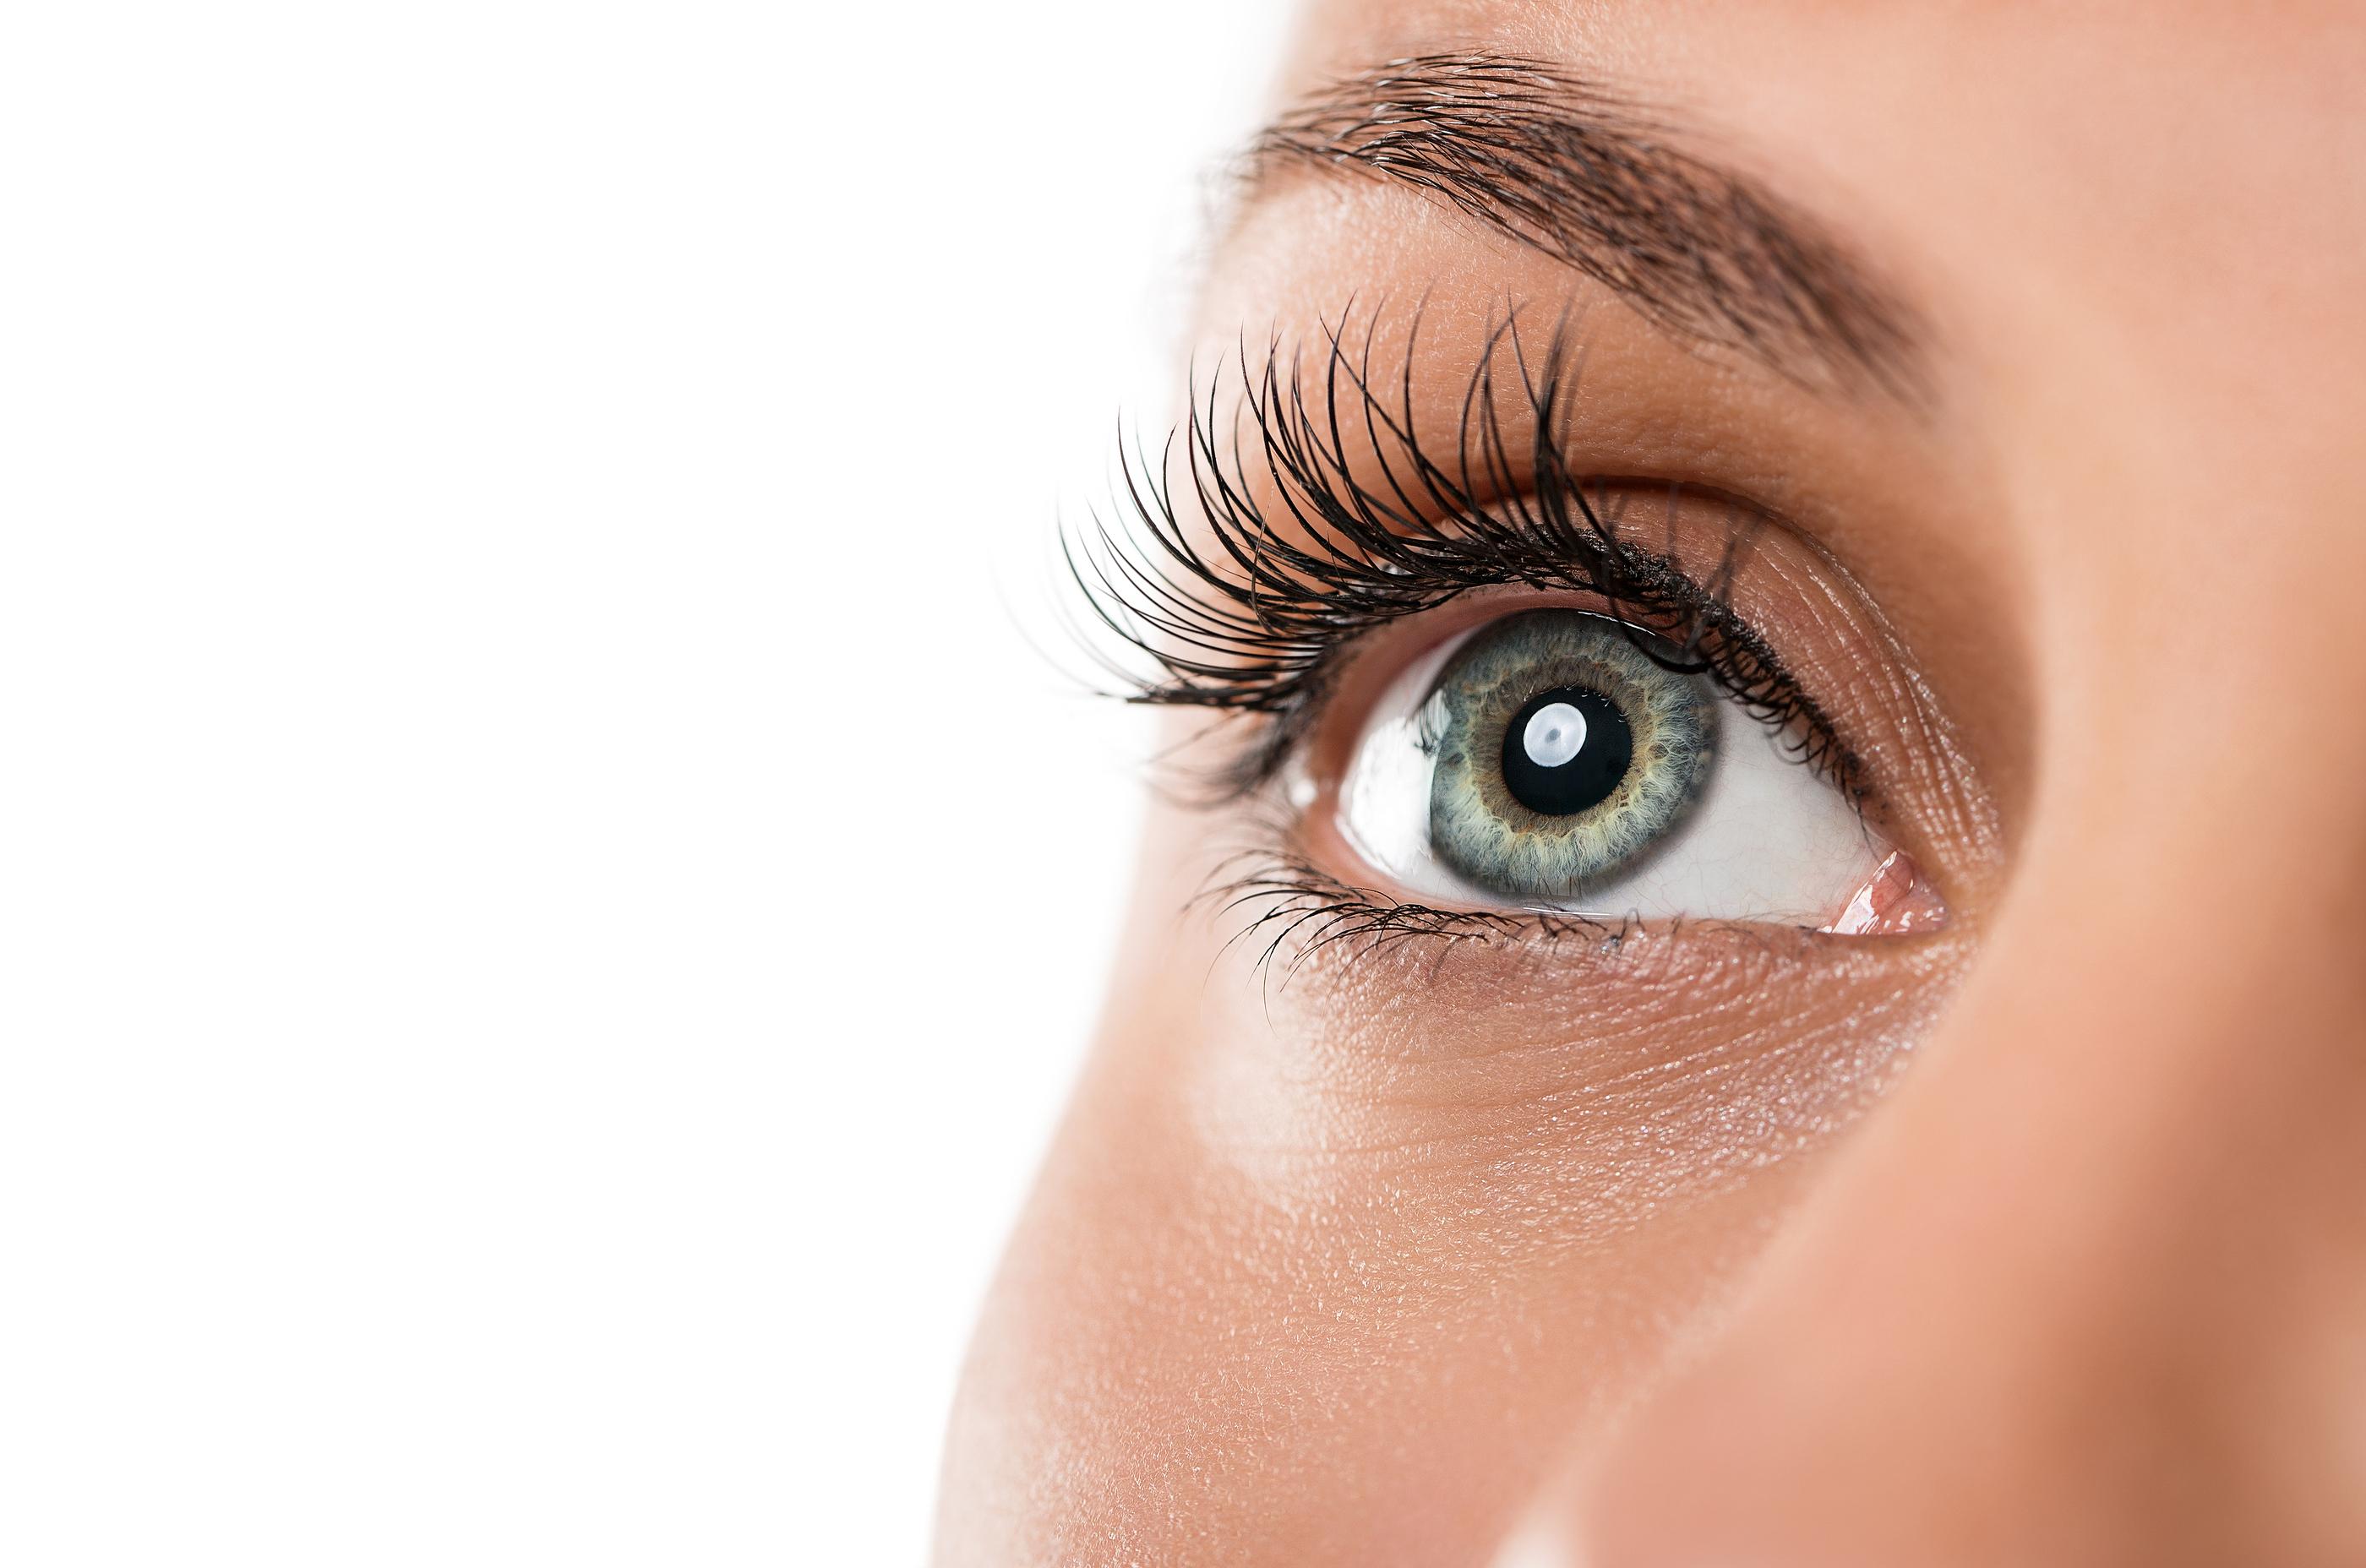 bigstock-Natural-Female-Eye-59583638.jpg